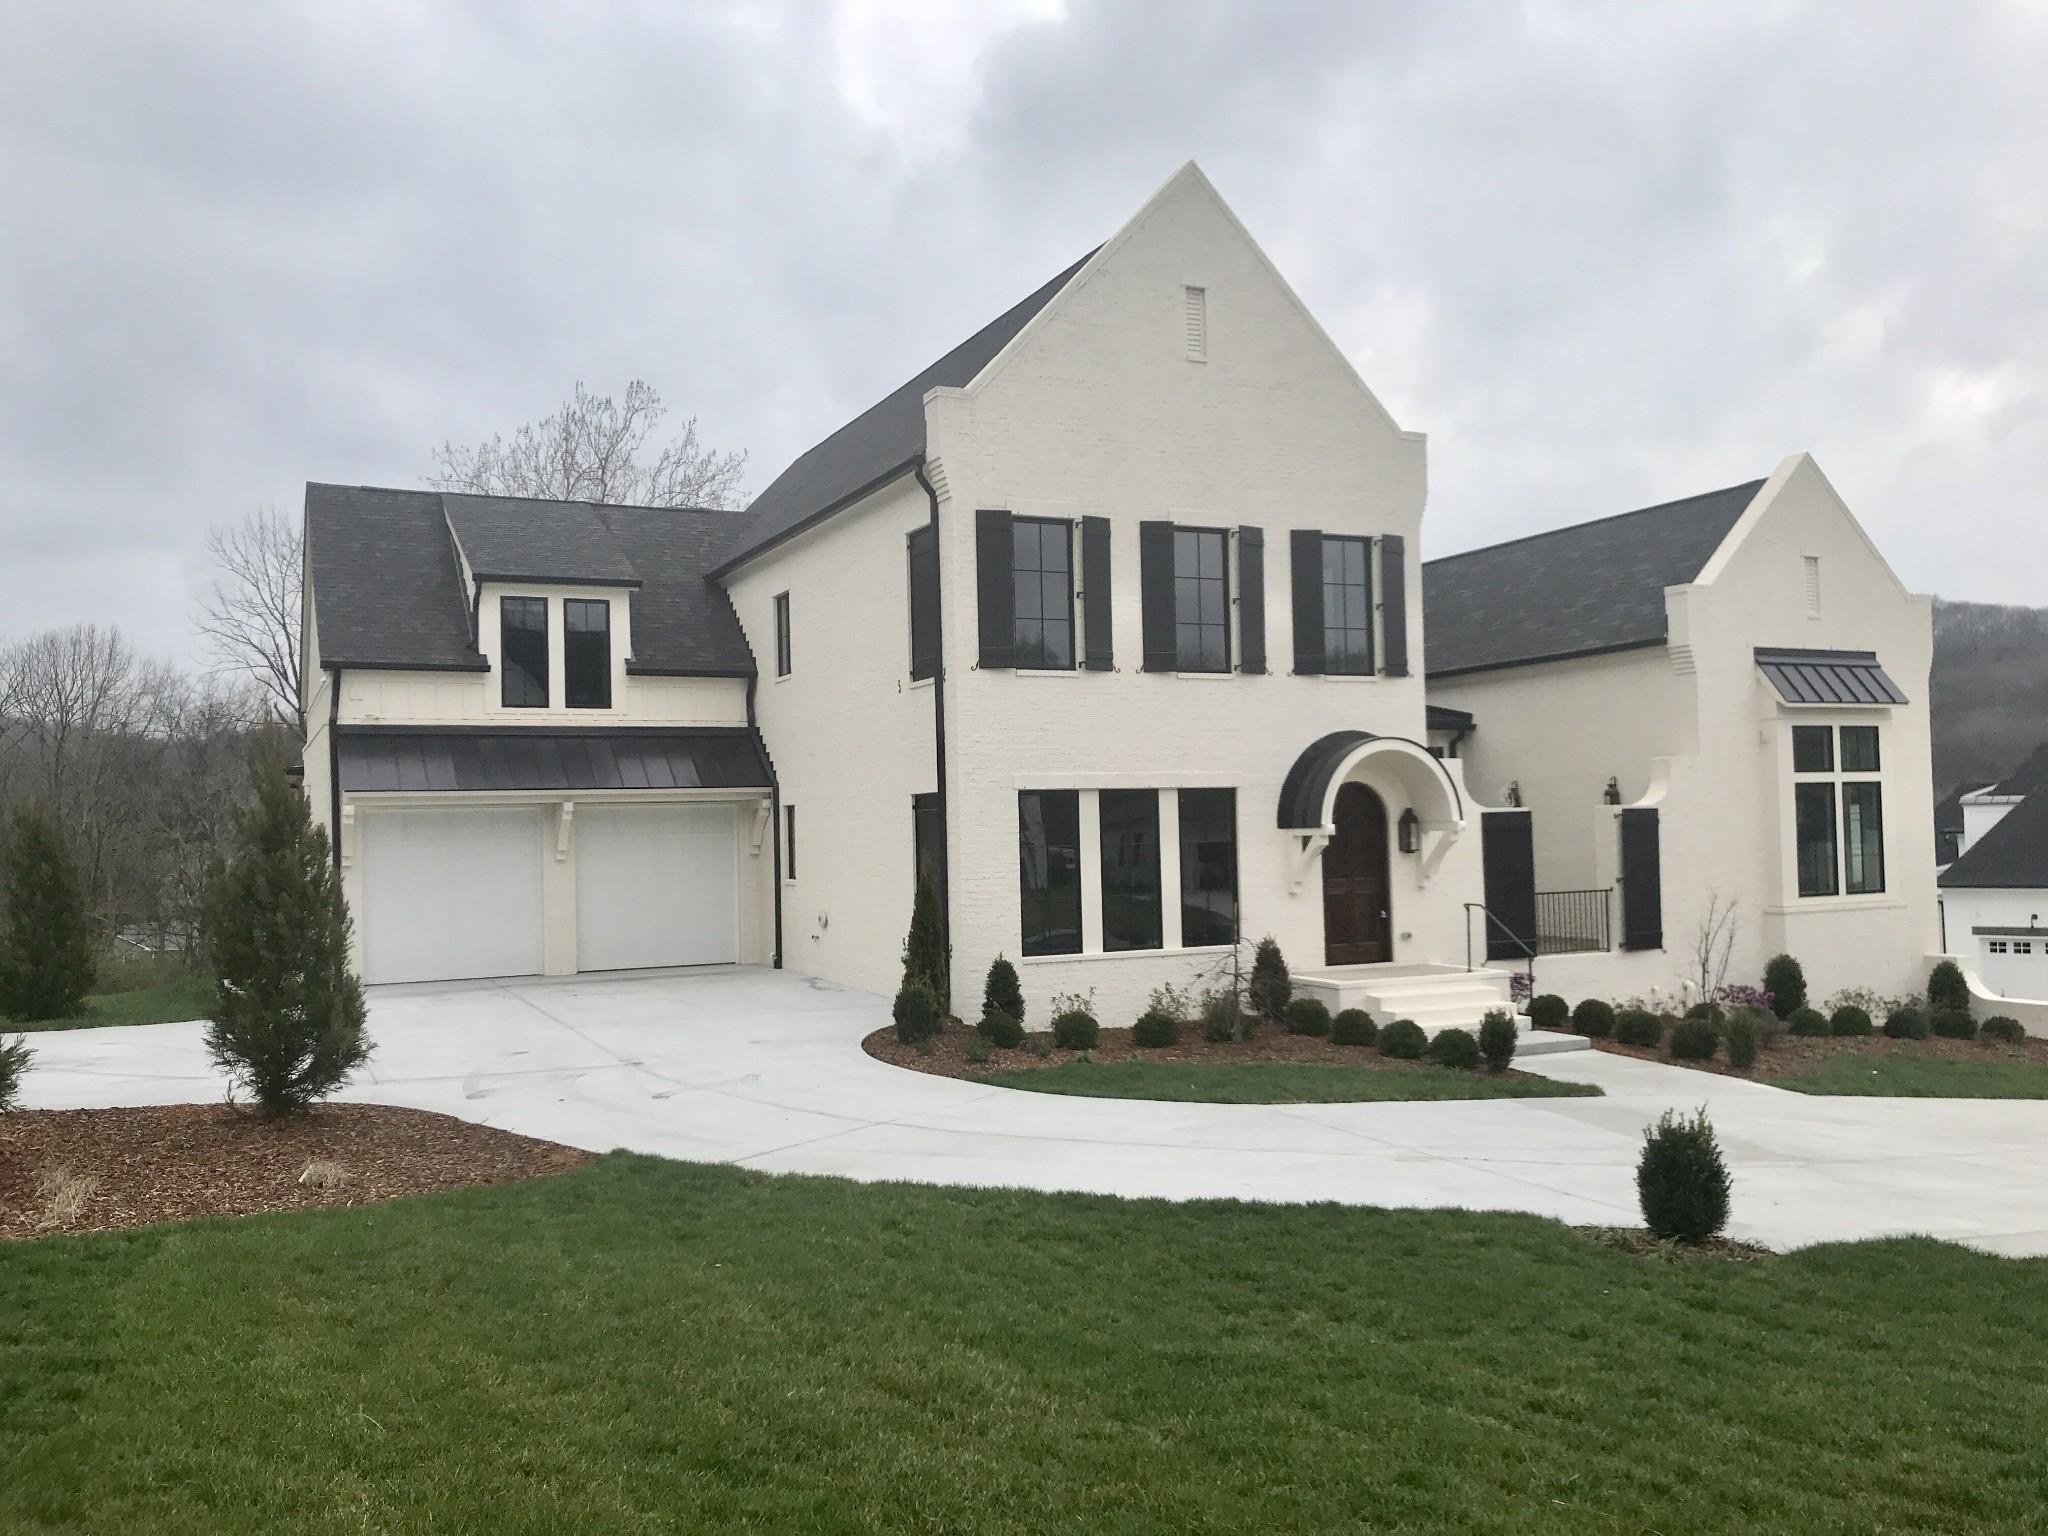 755 Steadman Ct, Brentwood, TN 37027 - Brentwood, TN real estate listing